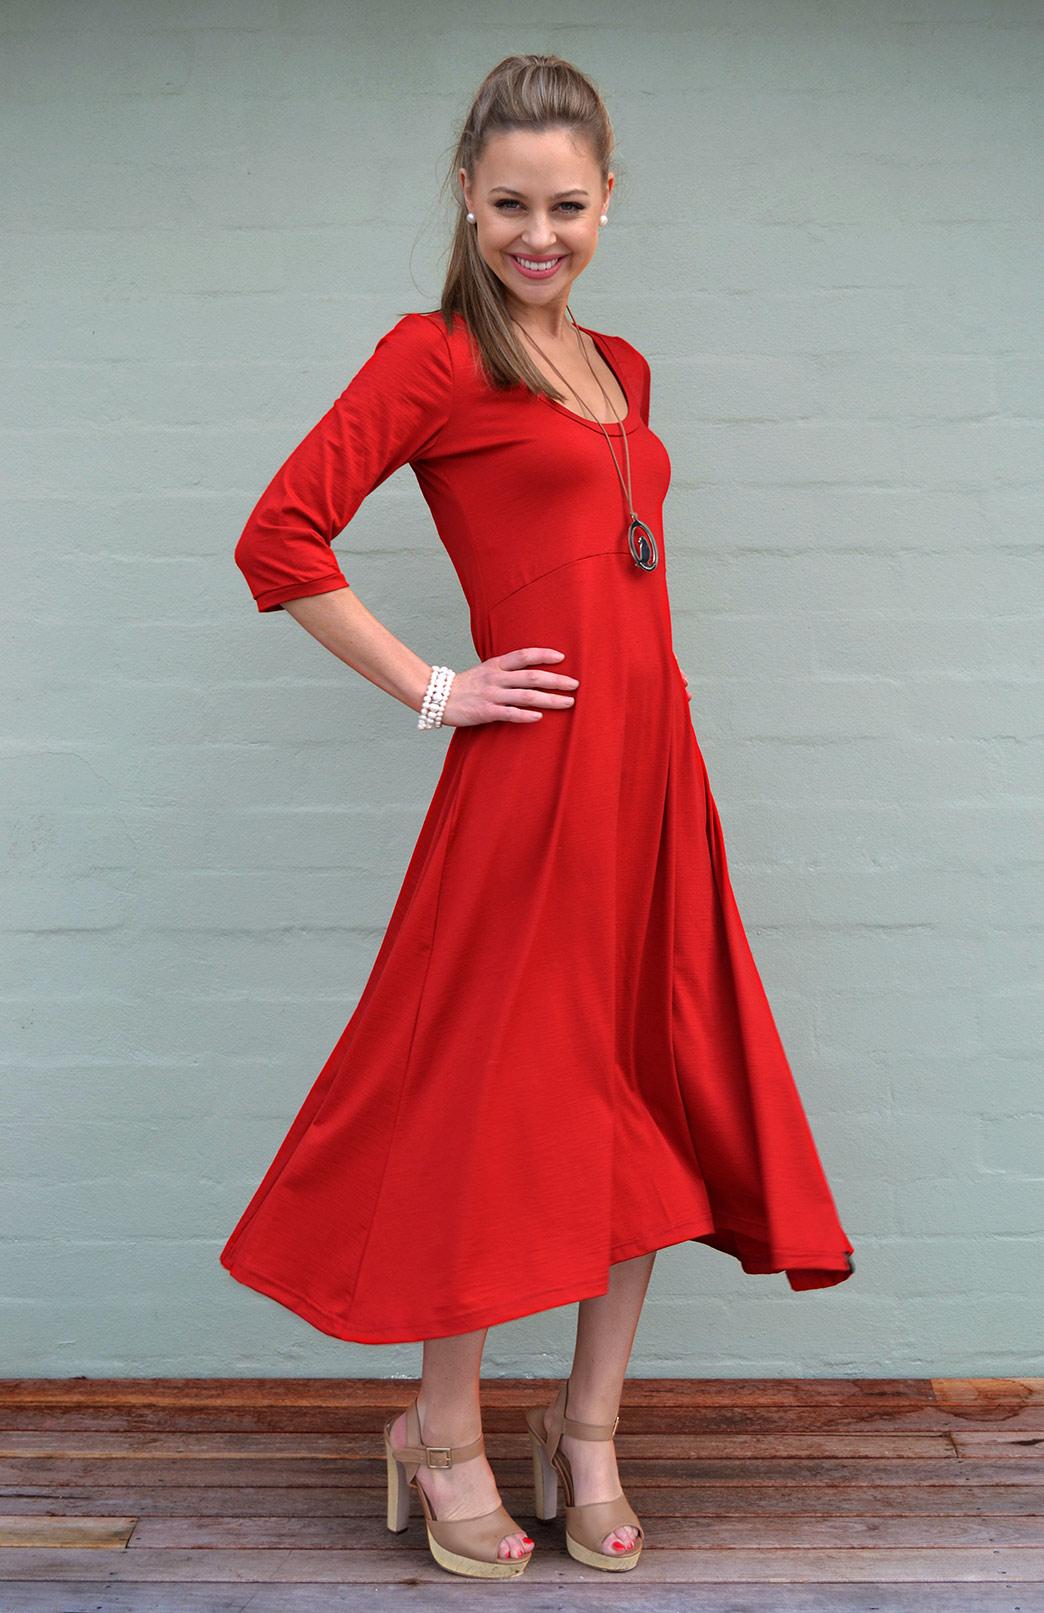 New Milly Dress - Smitten Merino Tasmania Australia